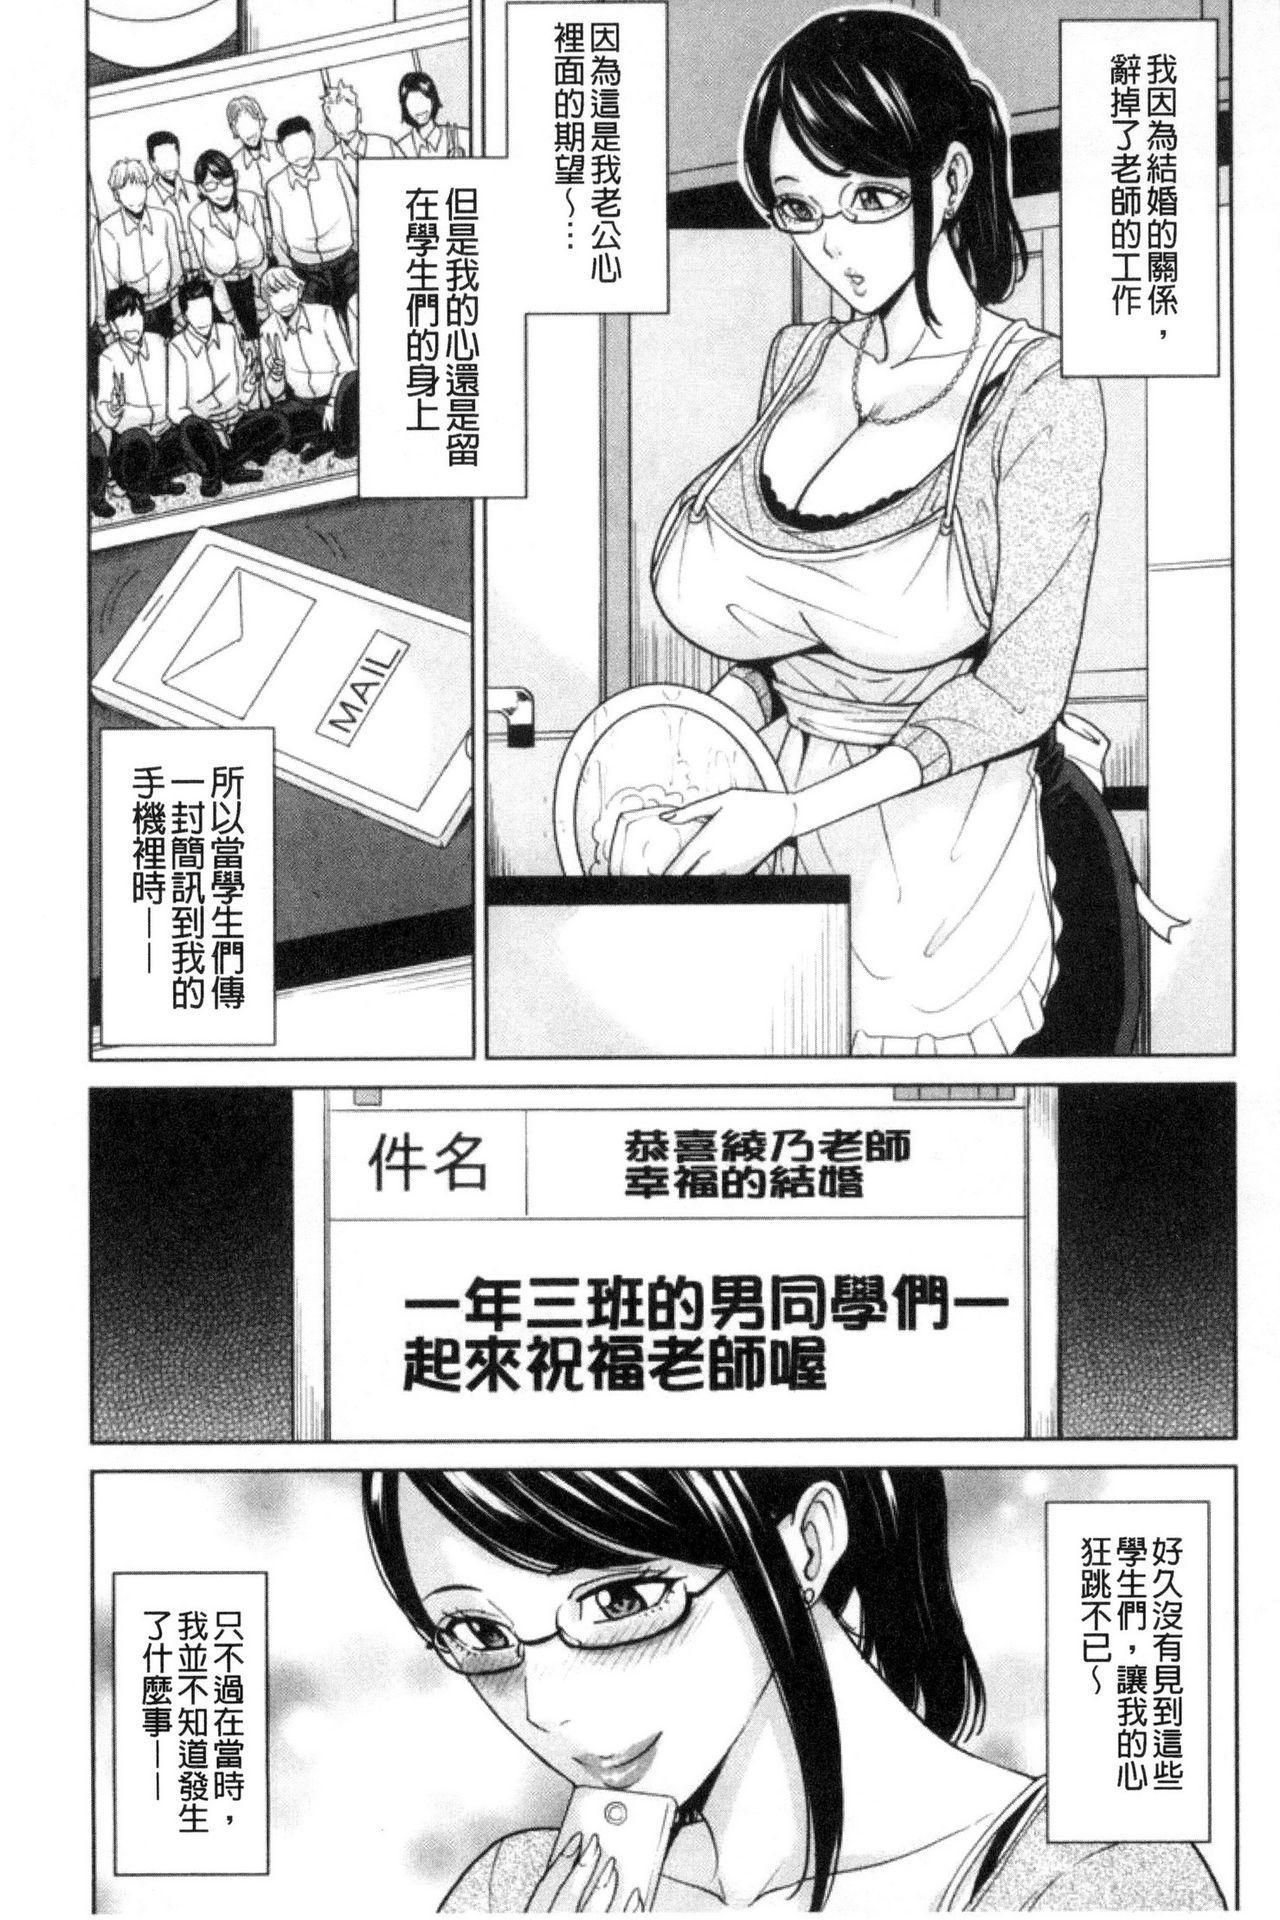 Aniyome Bitch Life   兄嫂淫蕩女性生活 121